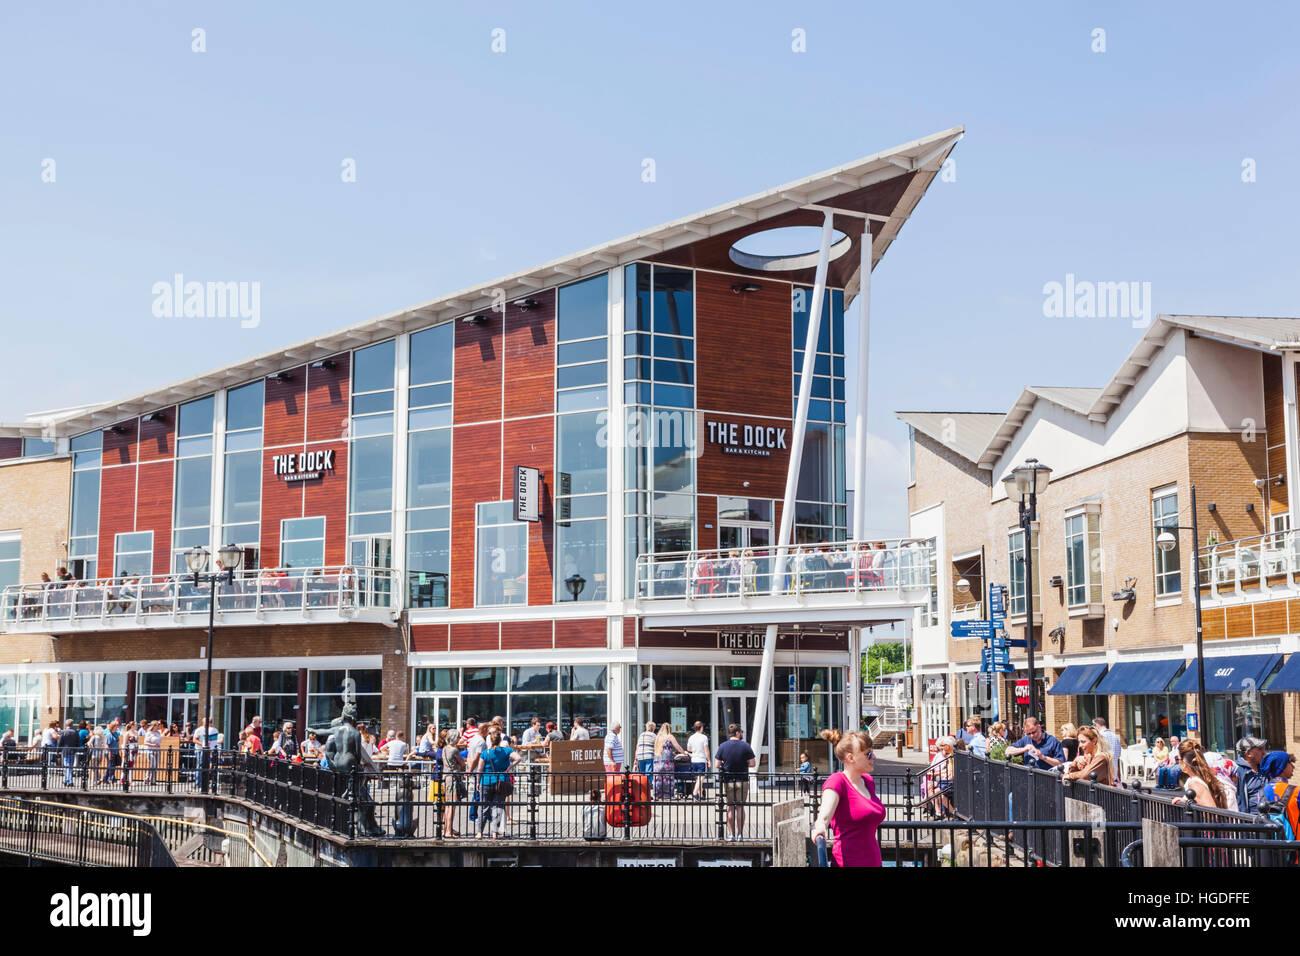 Wales, Cardiff, Cardiff Bay, Mermaid Quay, Waterfront Restaurants - Stock Image